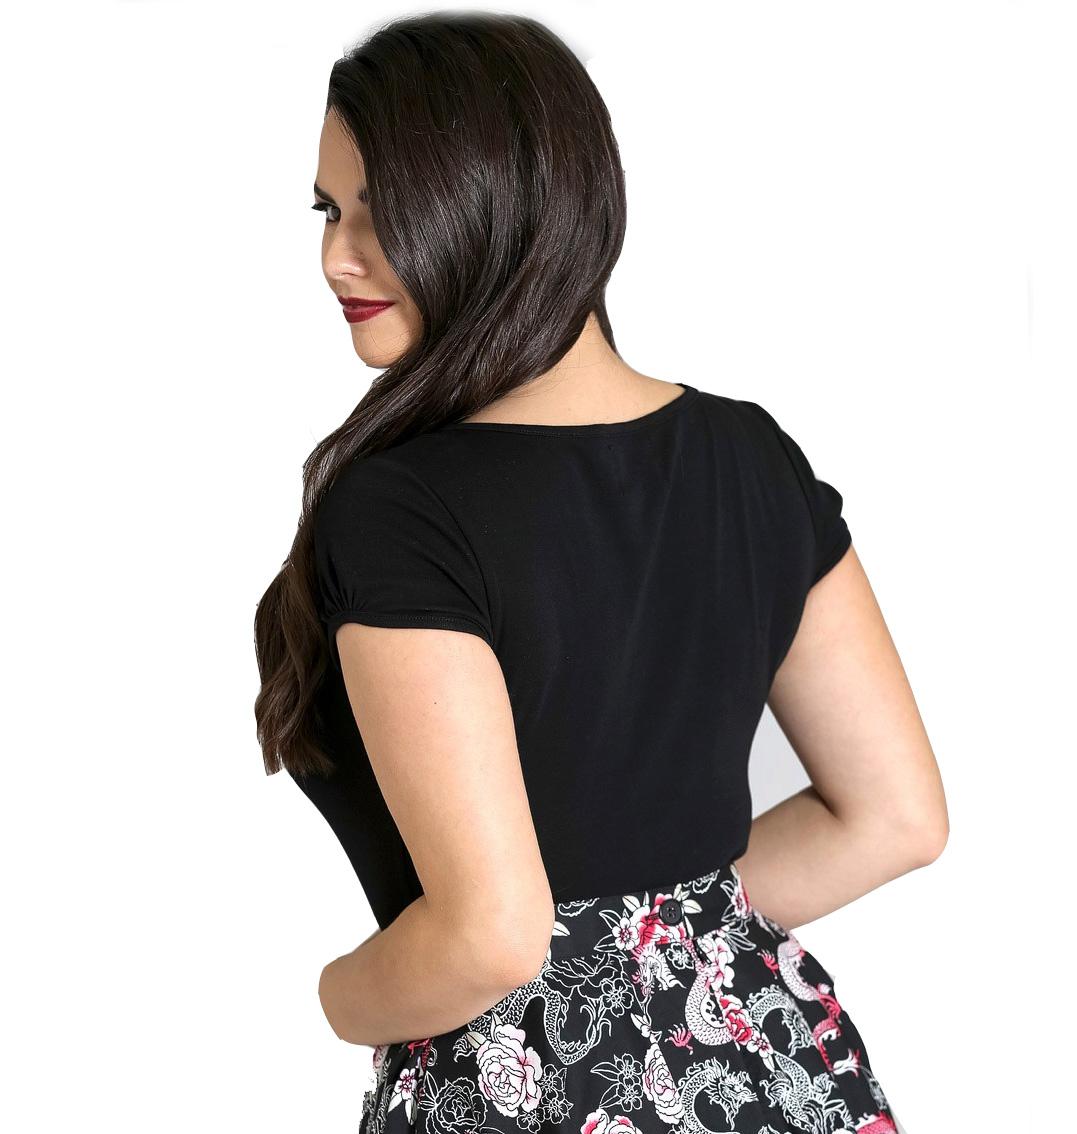 Hell-Bunny-Shirt-50s-Rockabilly-Top-MIA-Plain-Black-Short-Sleeves-All-Sizes thumbnail 47